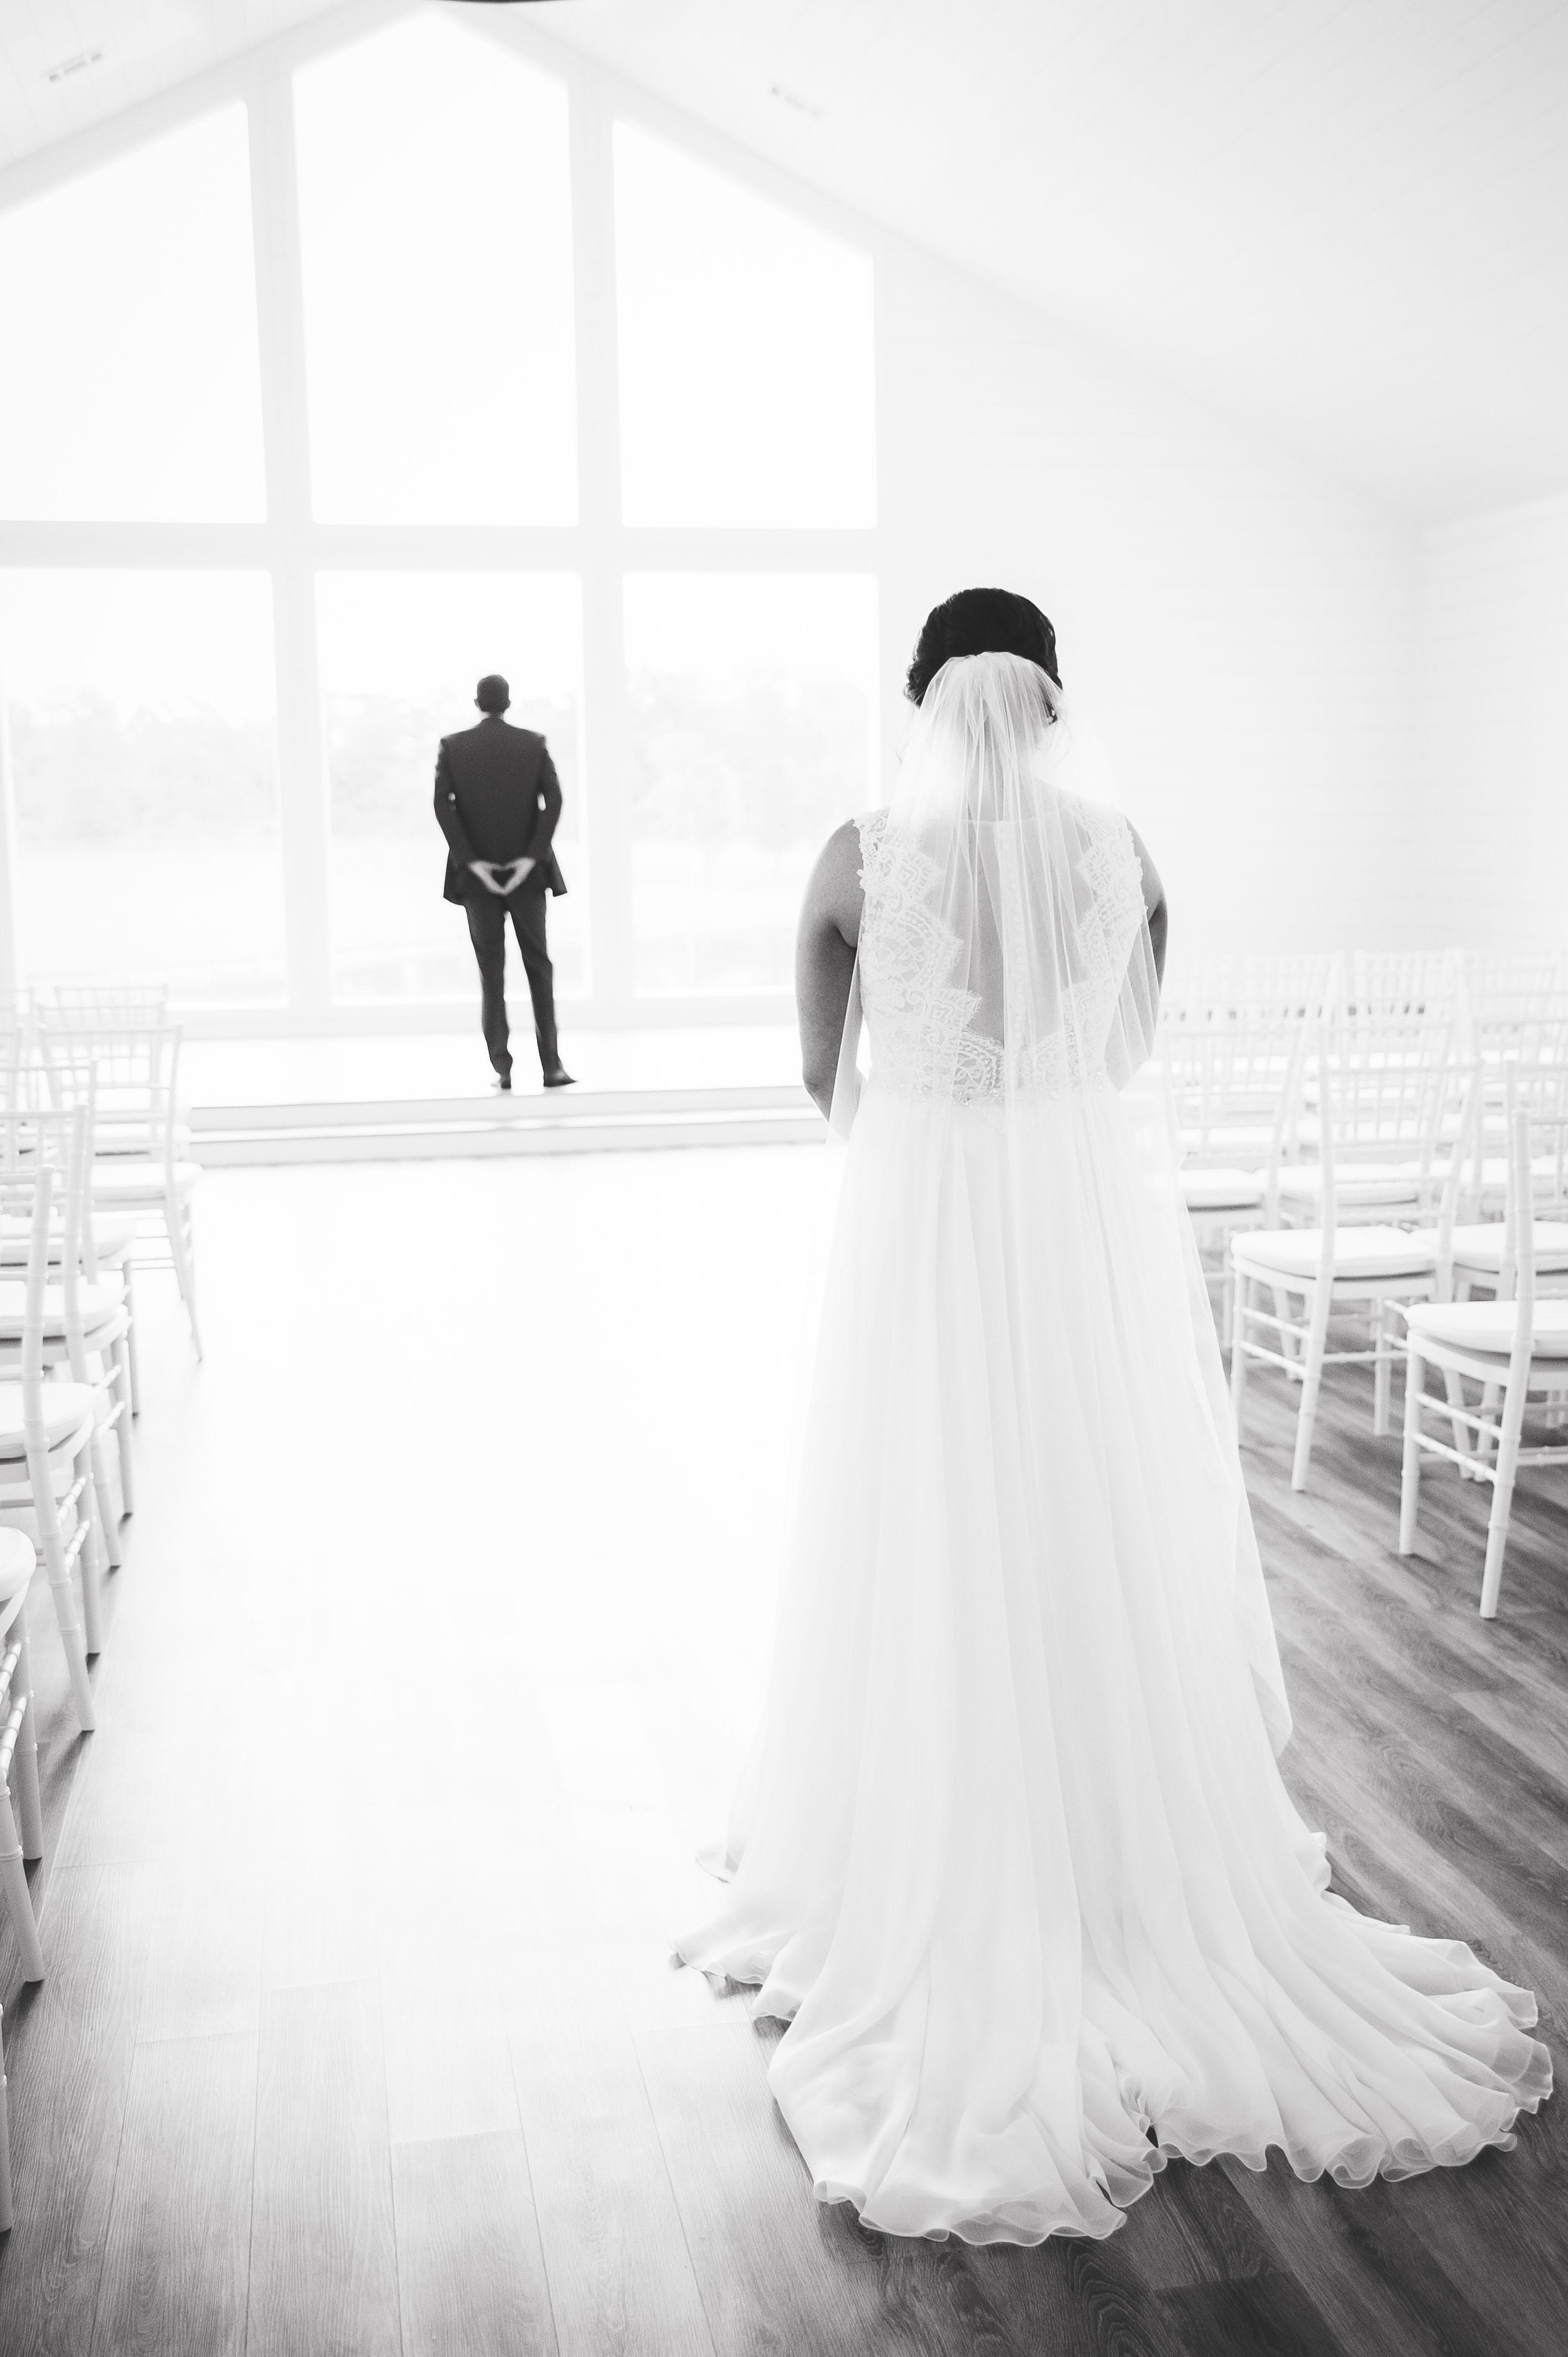 first look photos rachel driskell white room groom waiting bride behind